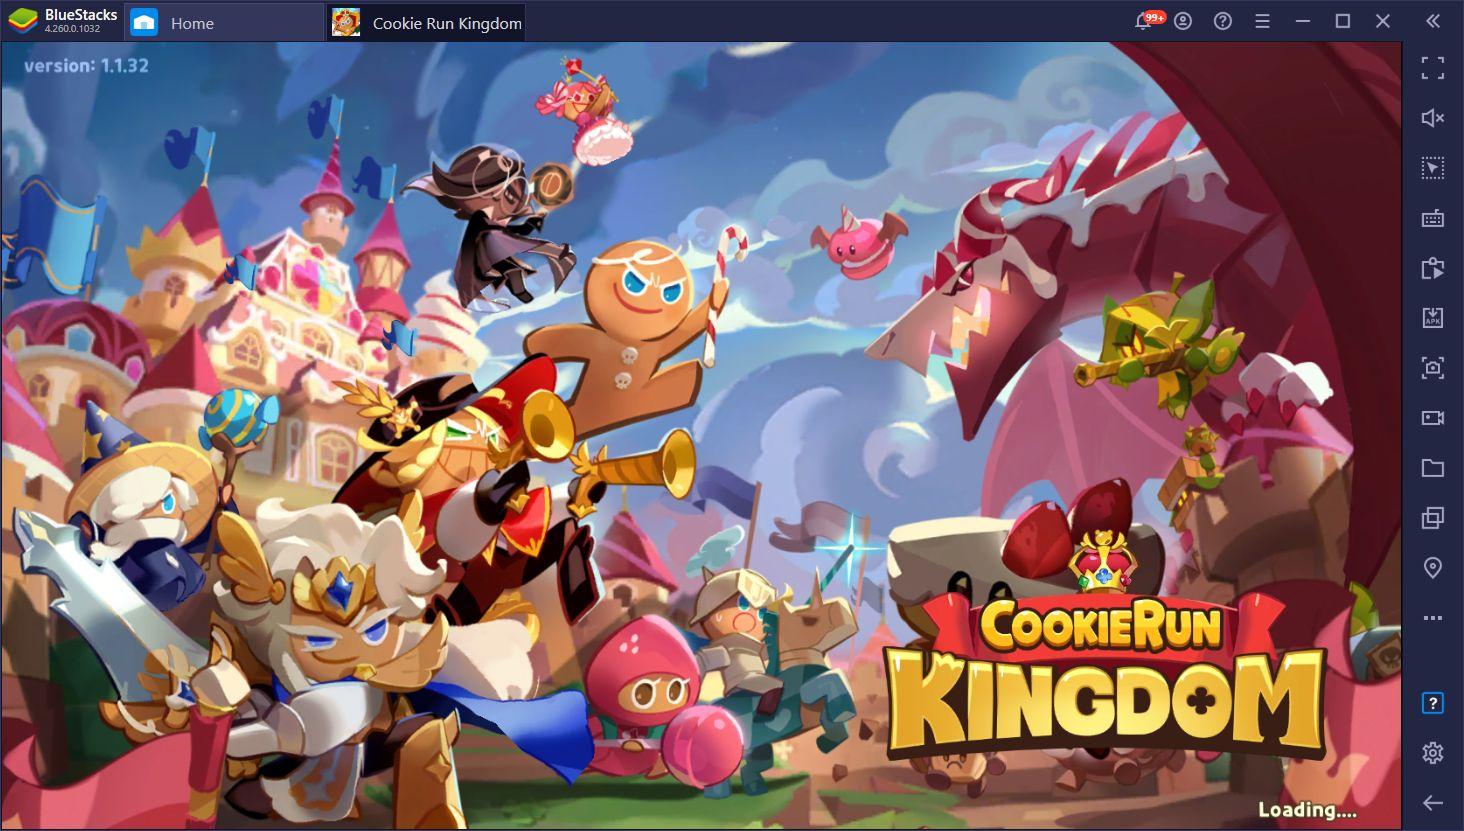 Cookie Run: Kingdom June 2021 redeem codes are here